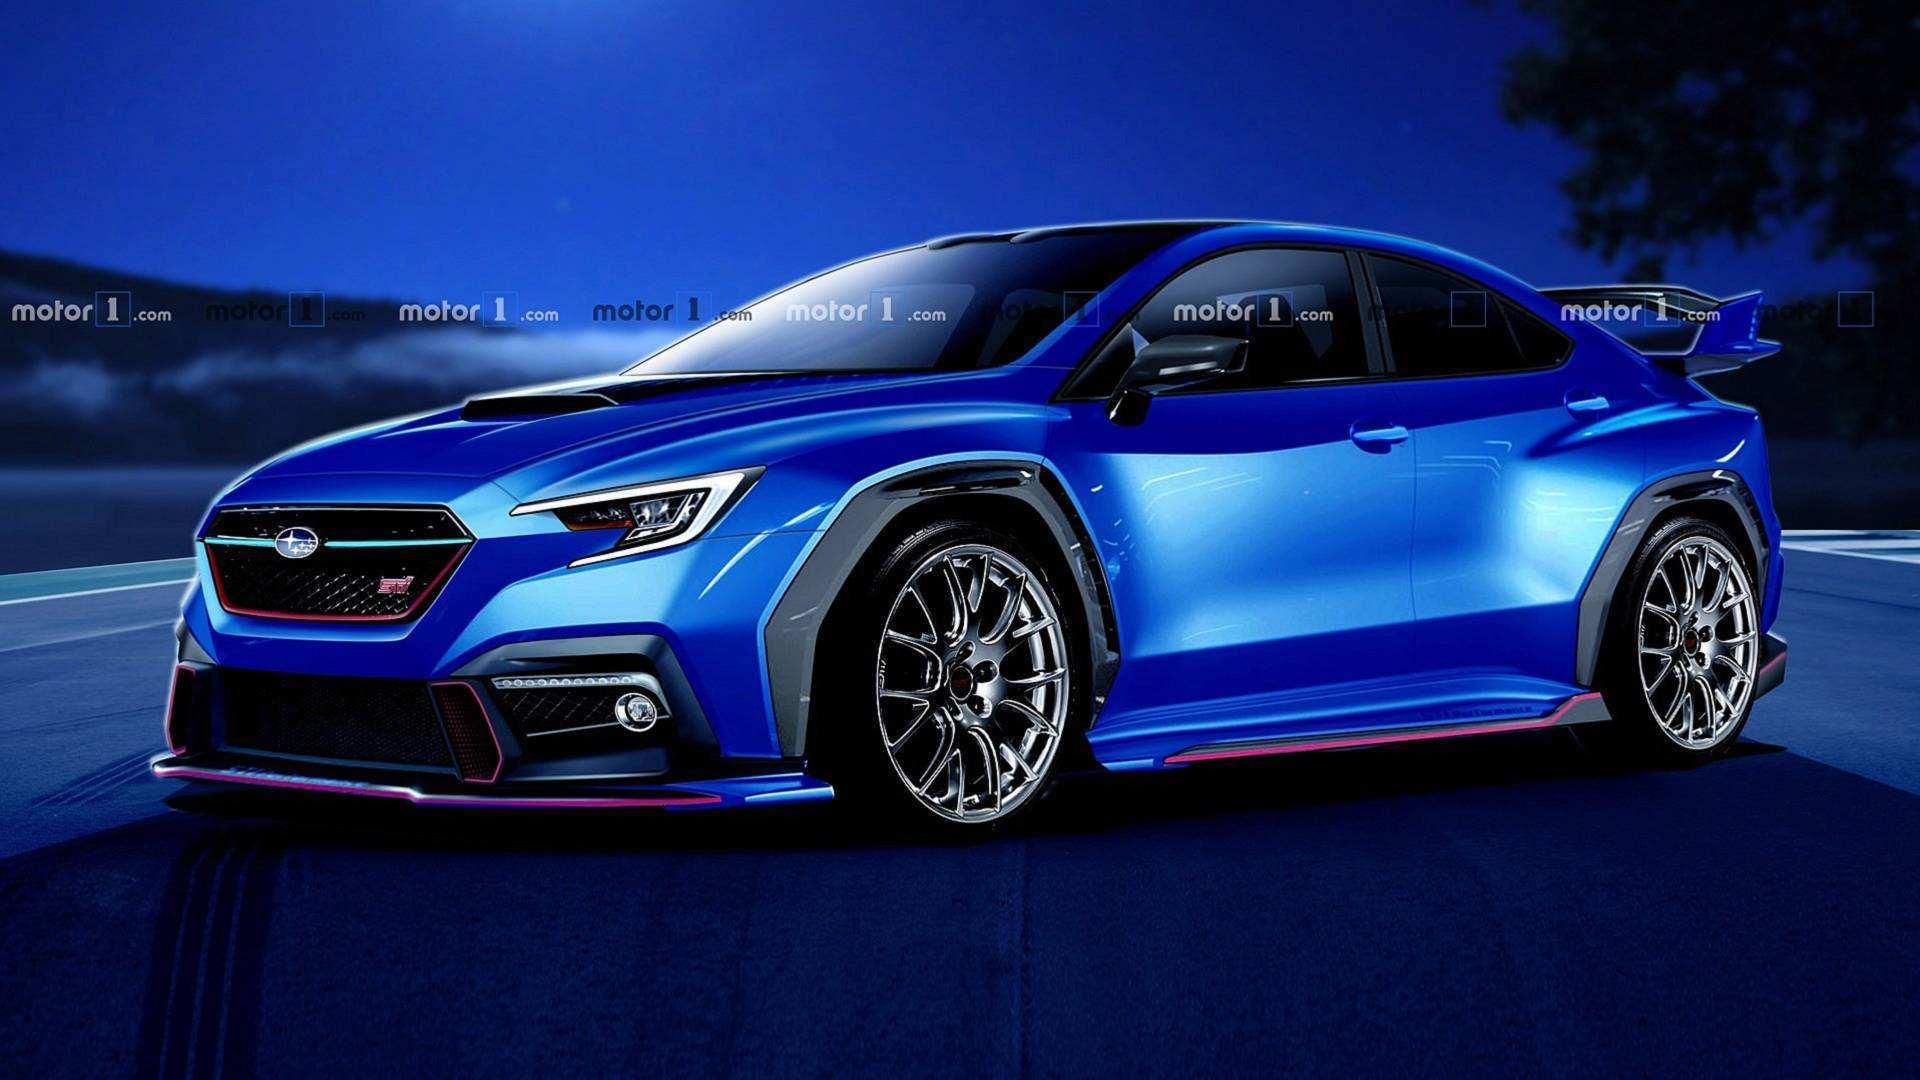 93 New Subaru Wrx 2020 Exterior with Subaru Wrx 2020